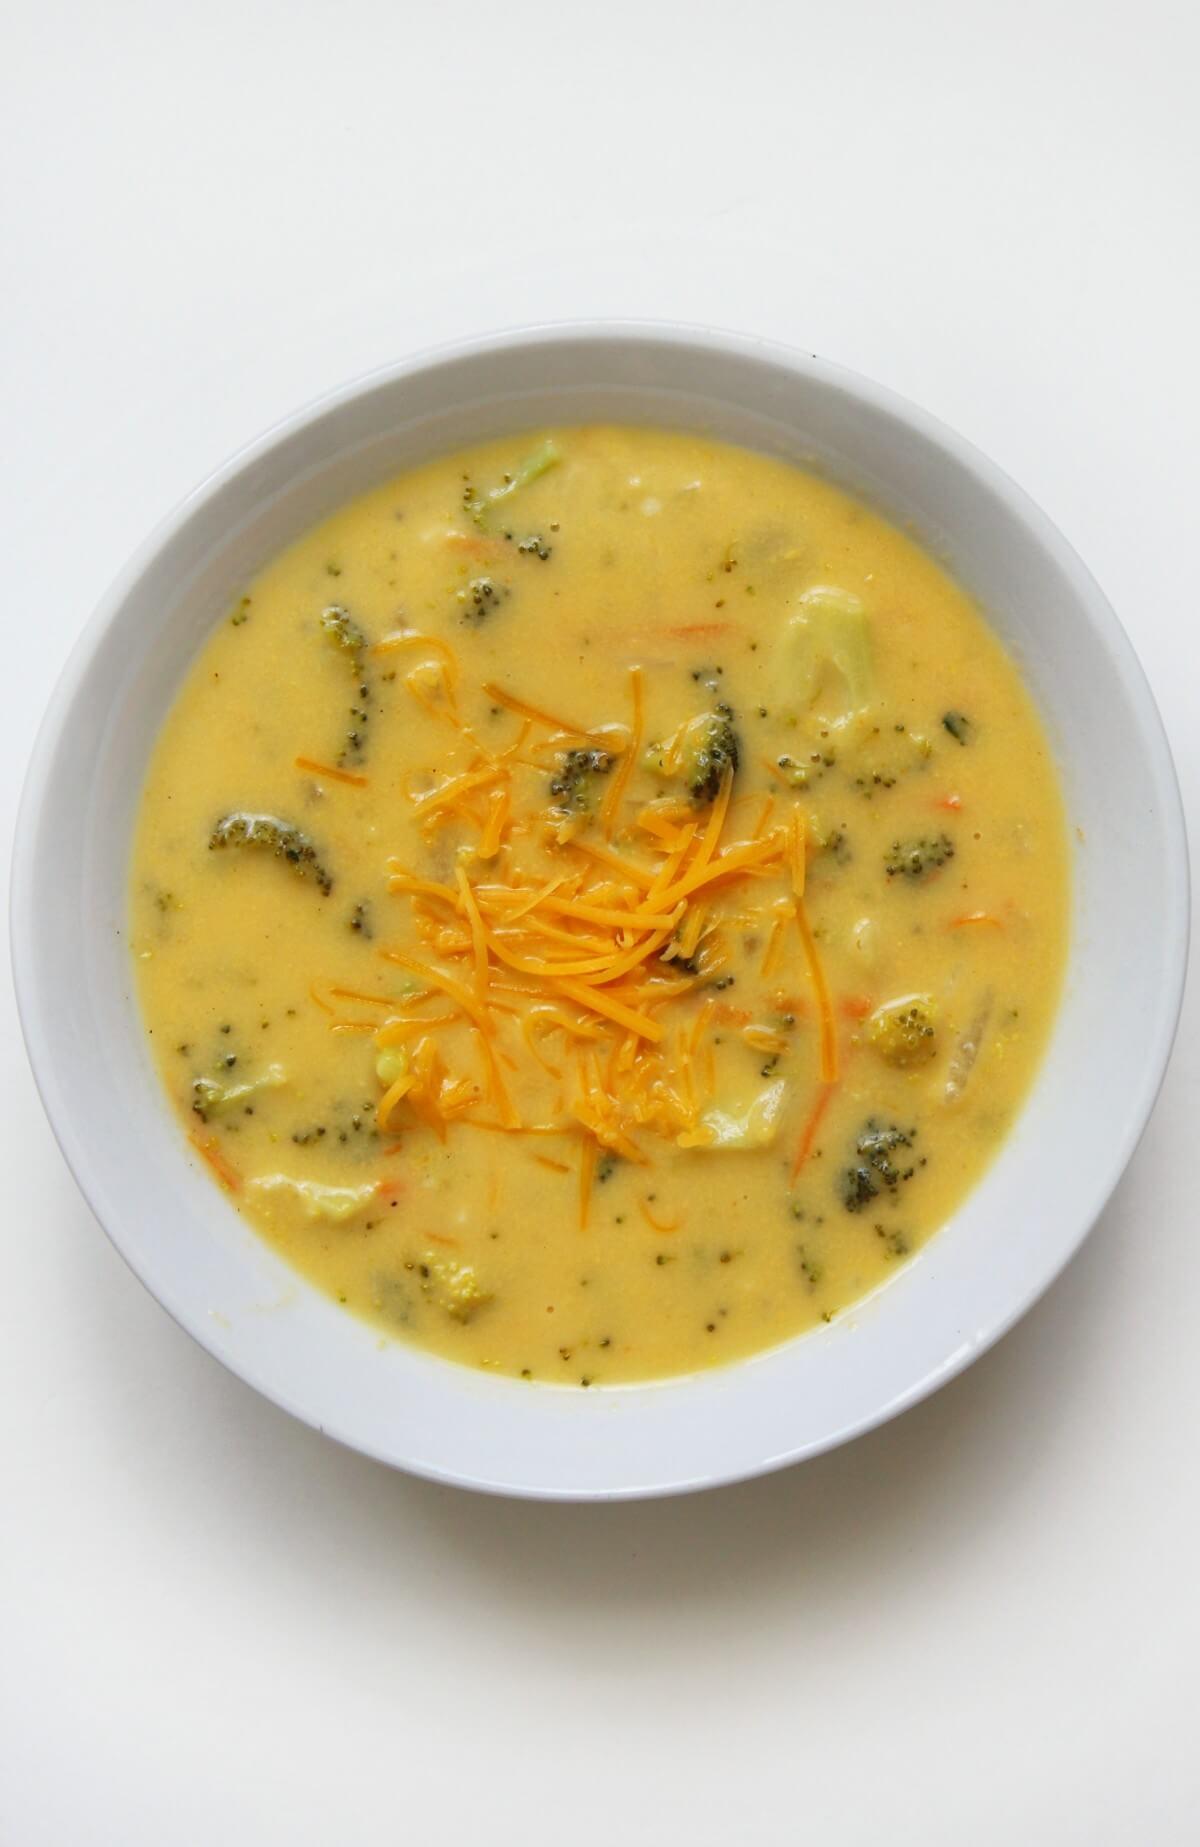 overhead view of vegan broccoli cheddar soup